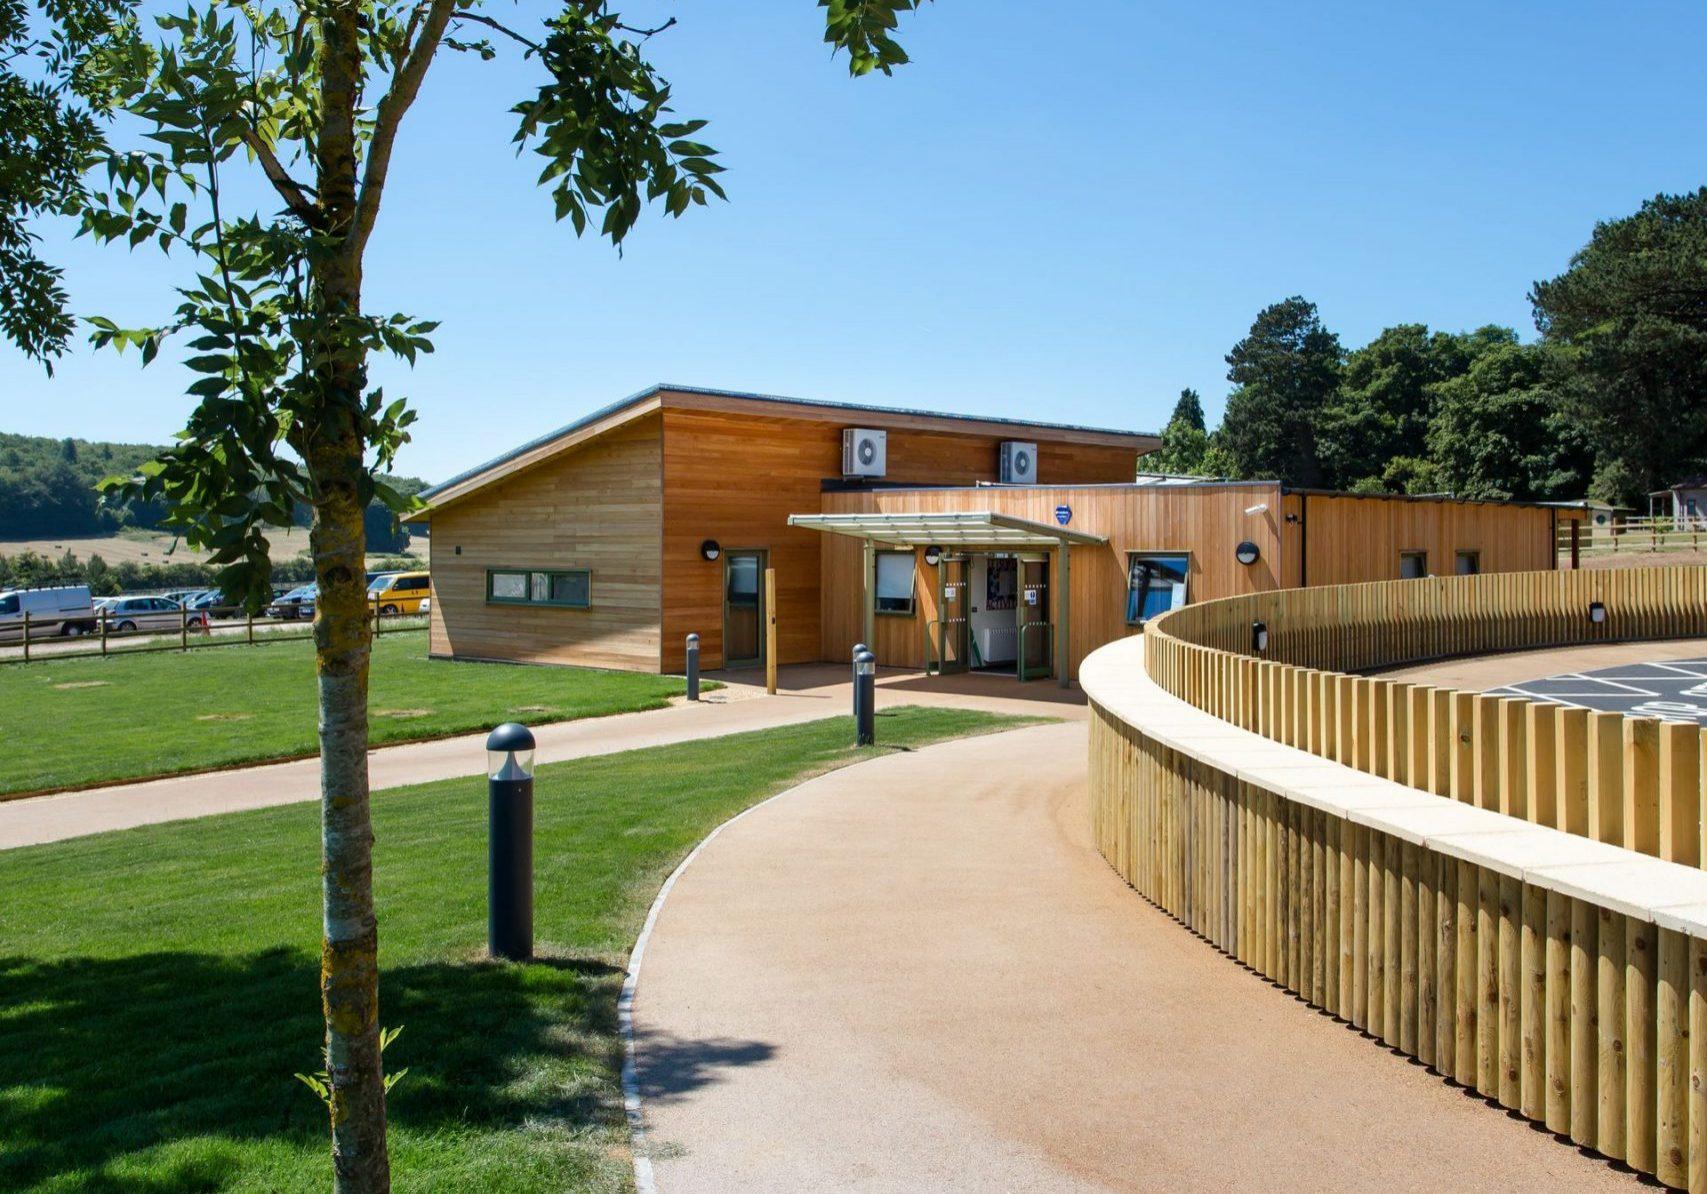 The National Star College, Ullenwood, Cheltenham, UK.